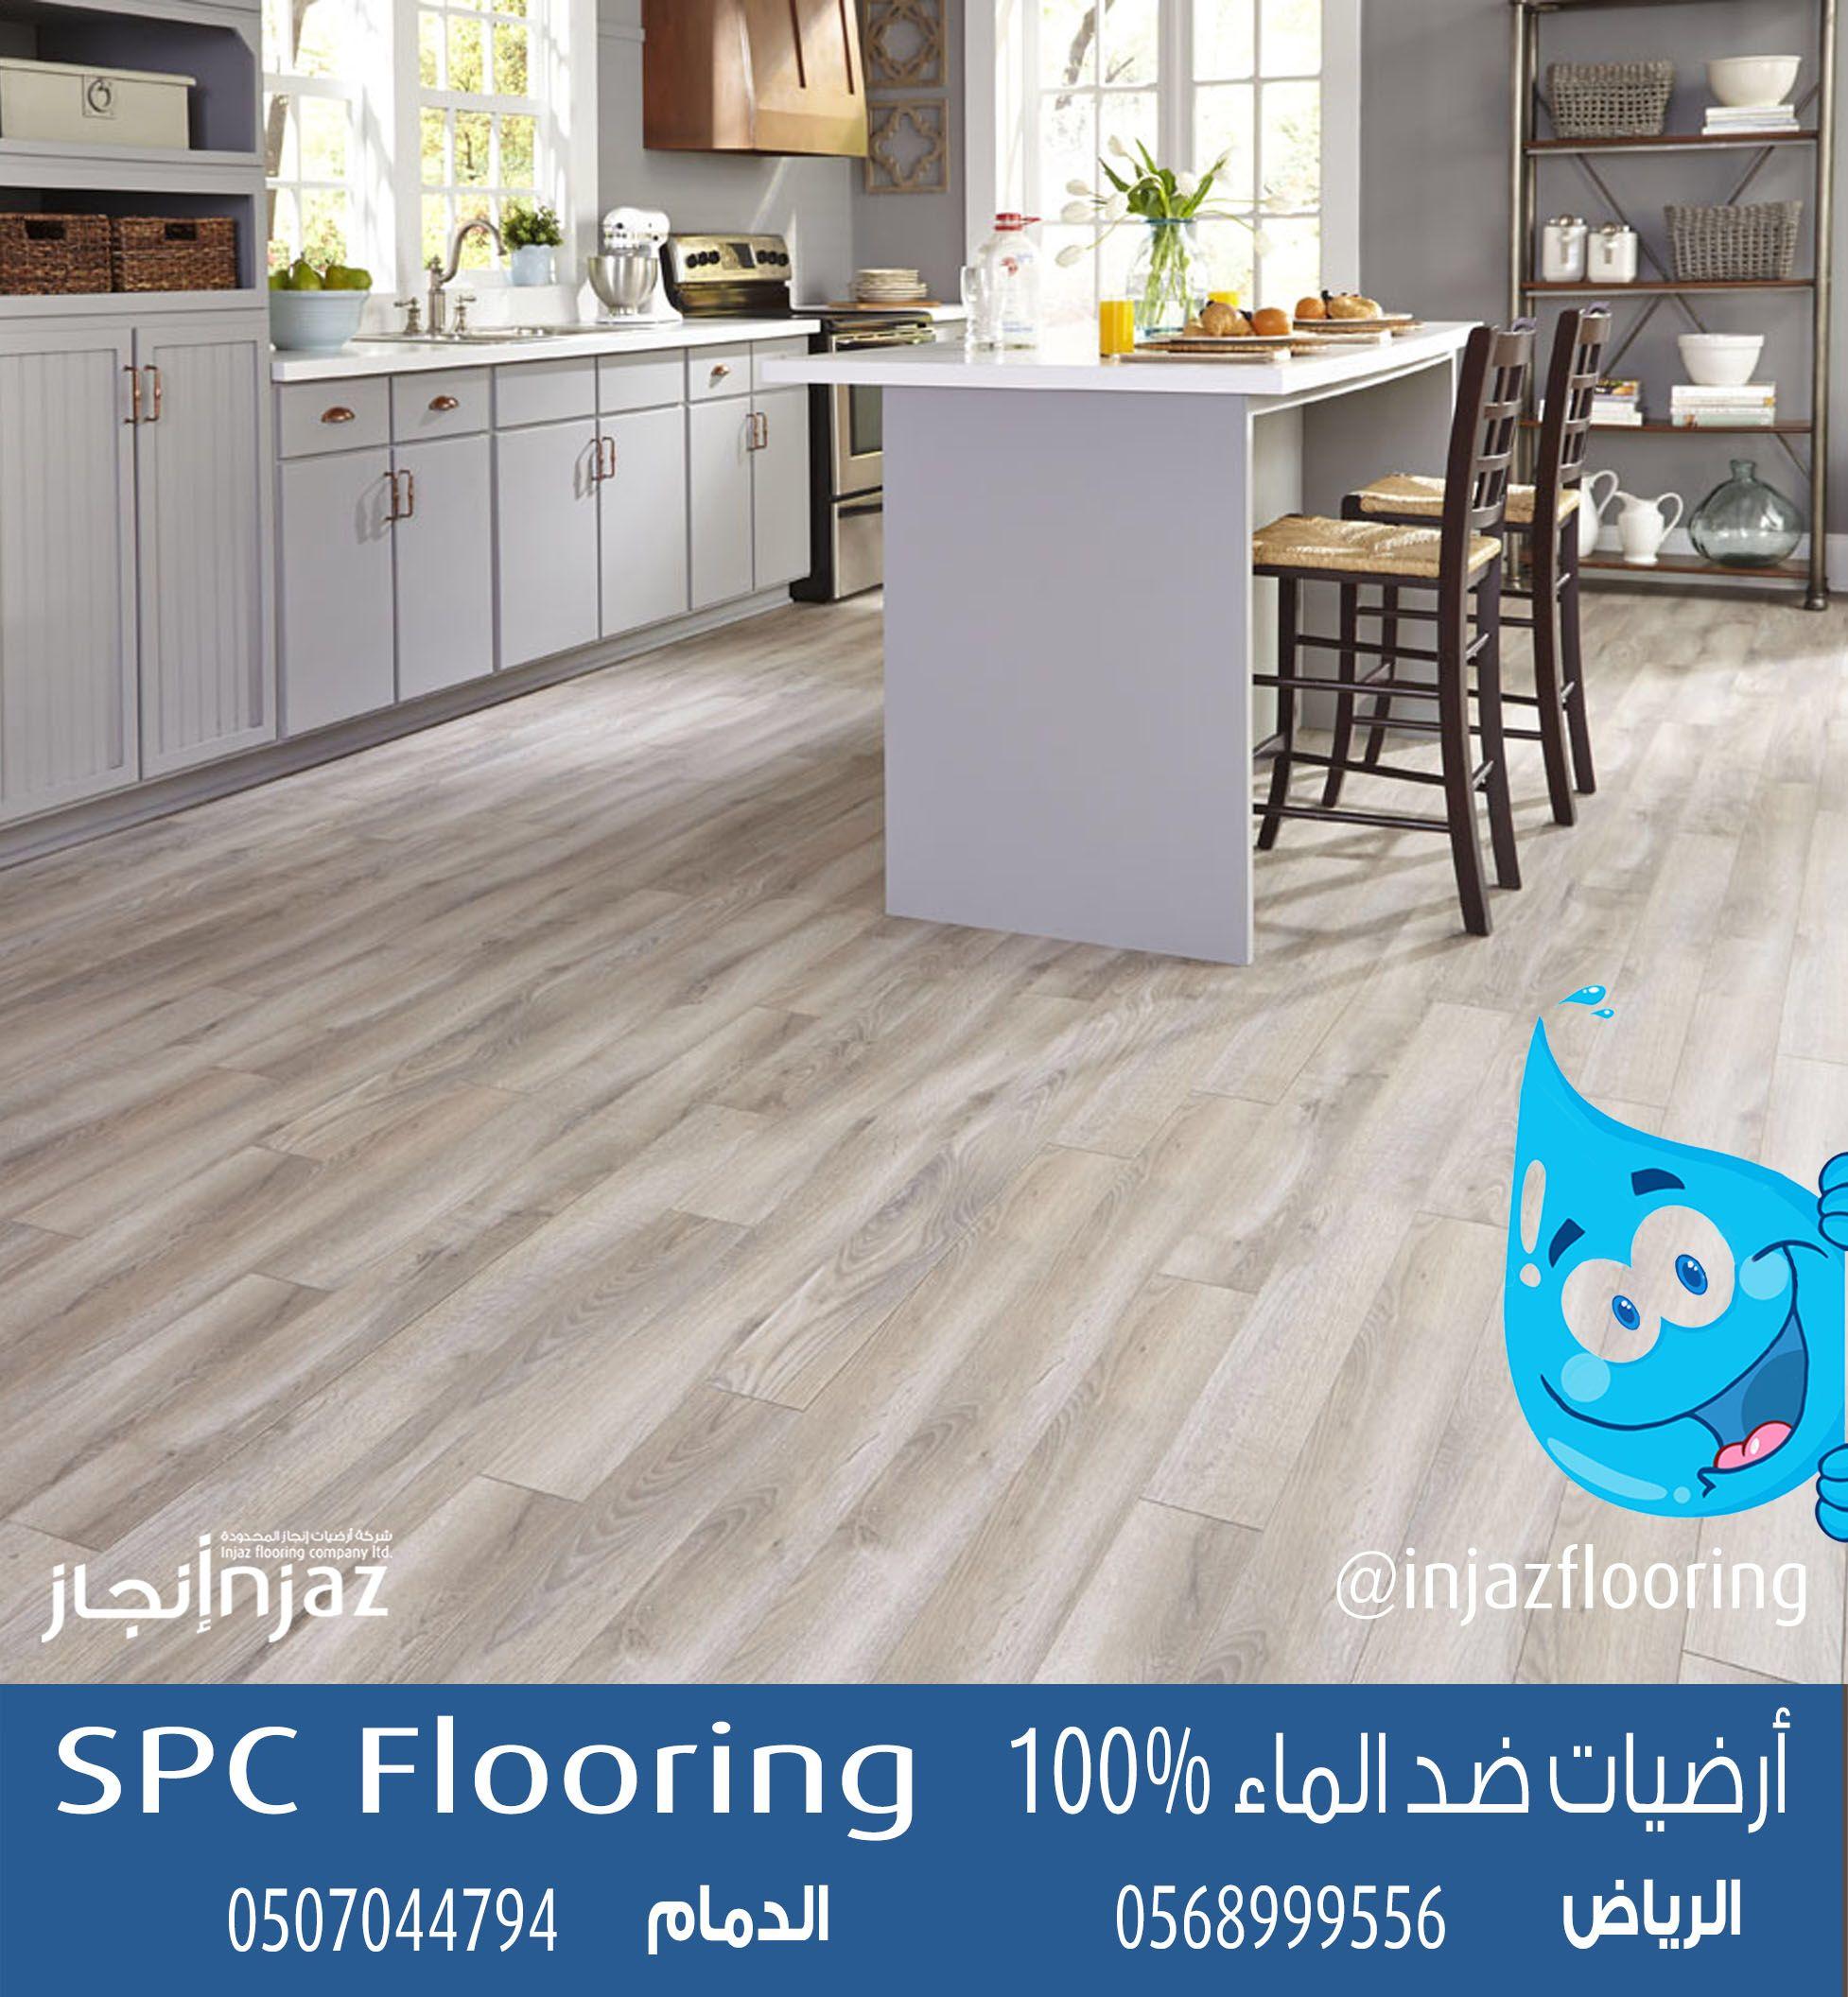 ارضيا ضد الماء Spc Flooring Cool House Designs Flooring Design